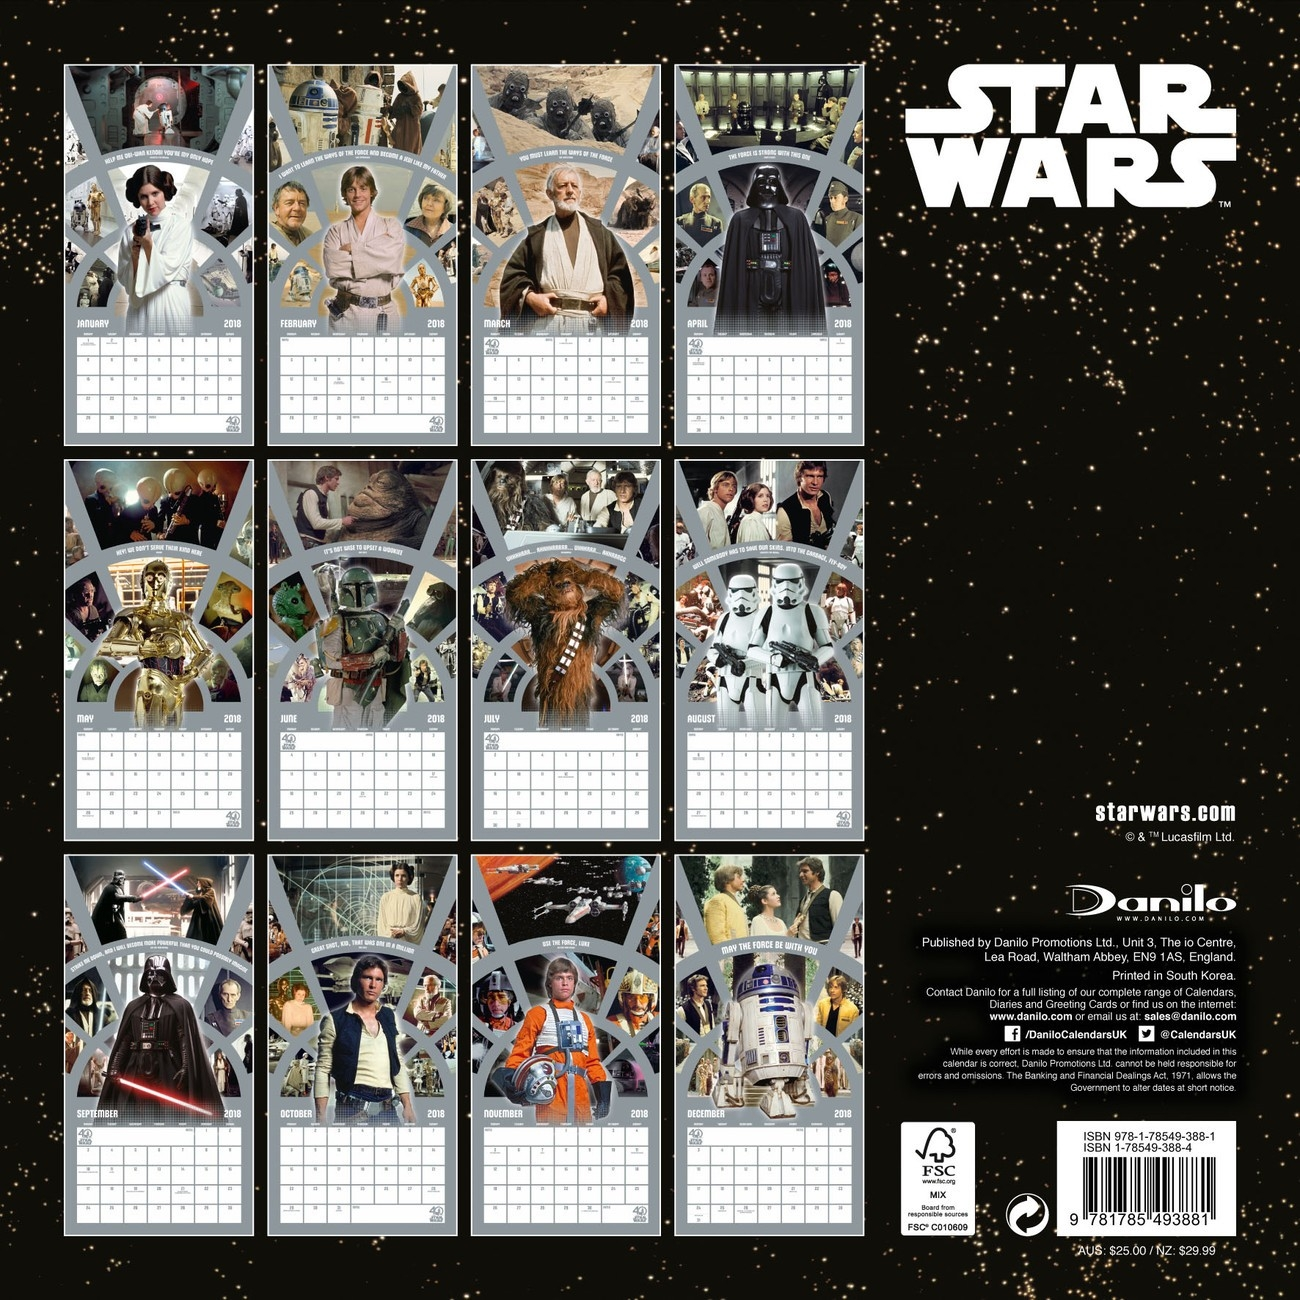 Calendar 2020 Star Wars 40Th Anniversary  Calendario Star Wars 2020 Para Imprimir